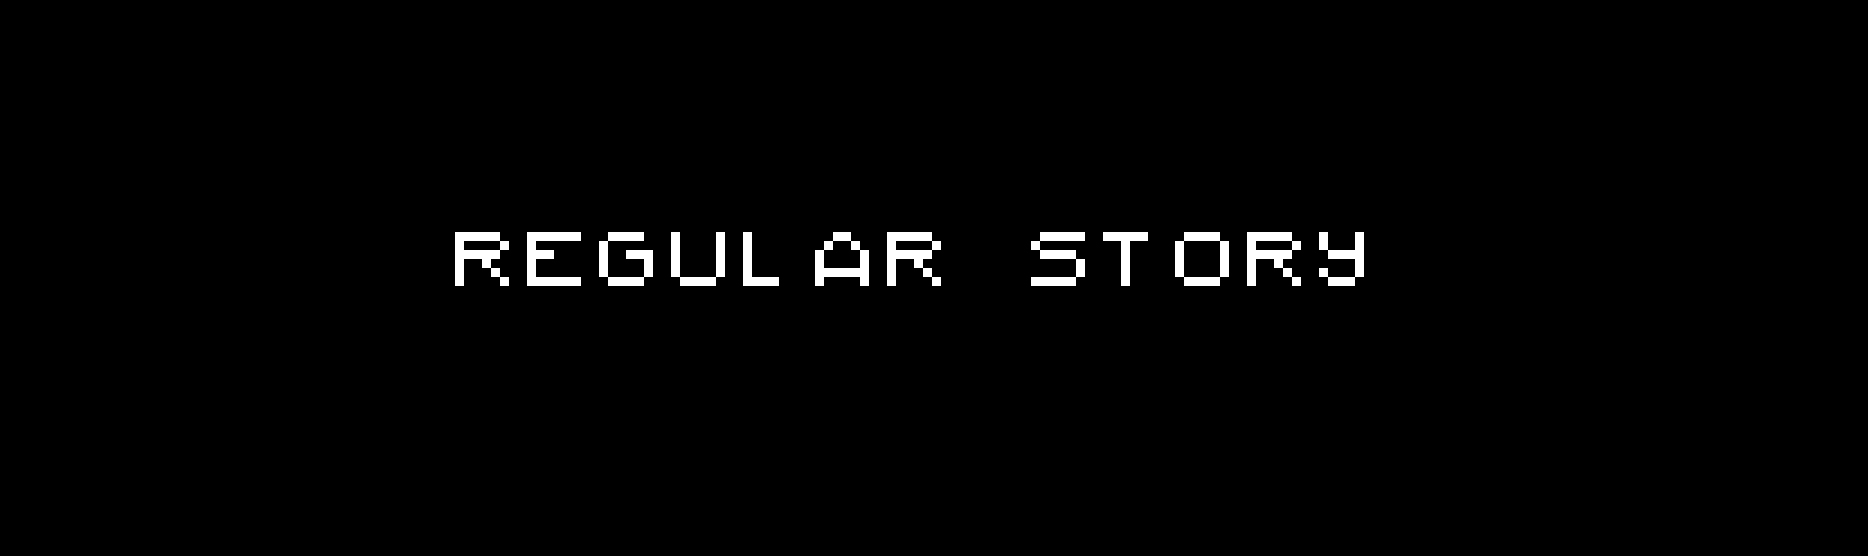 Regular Story